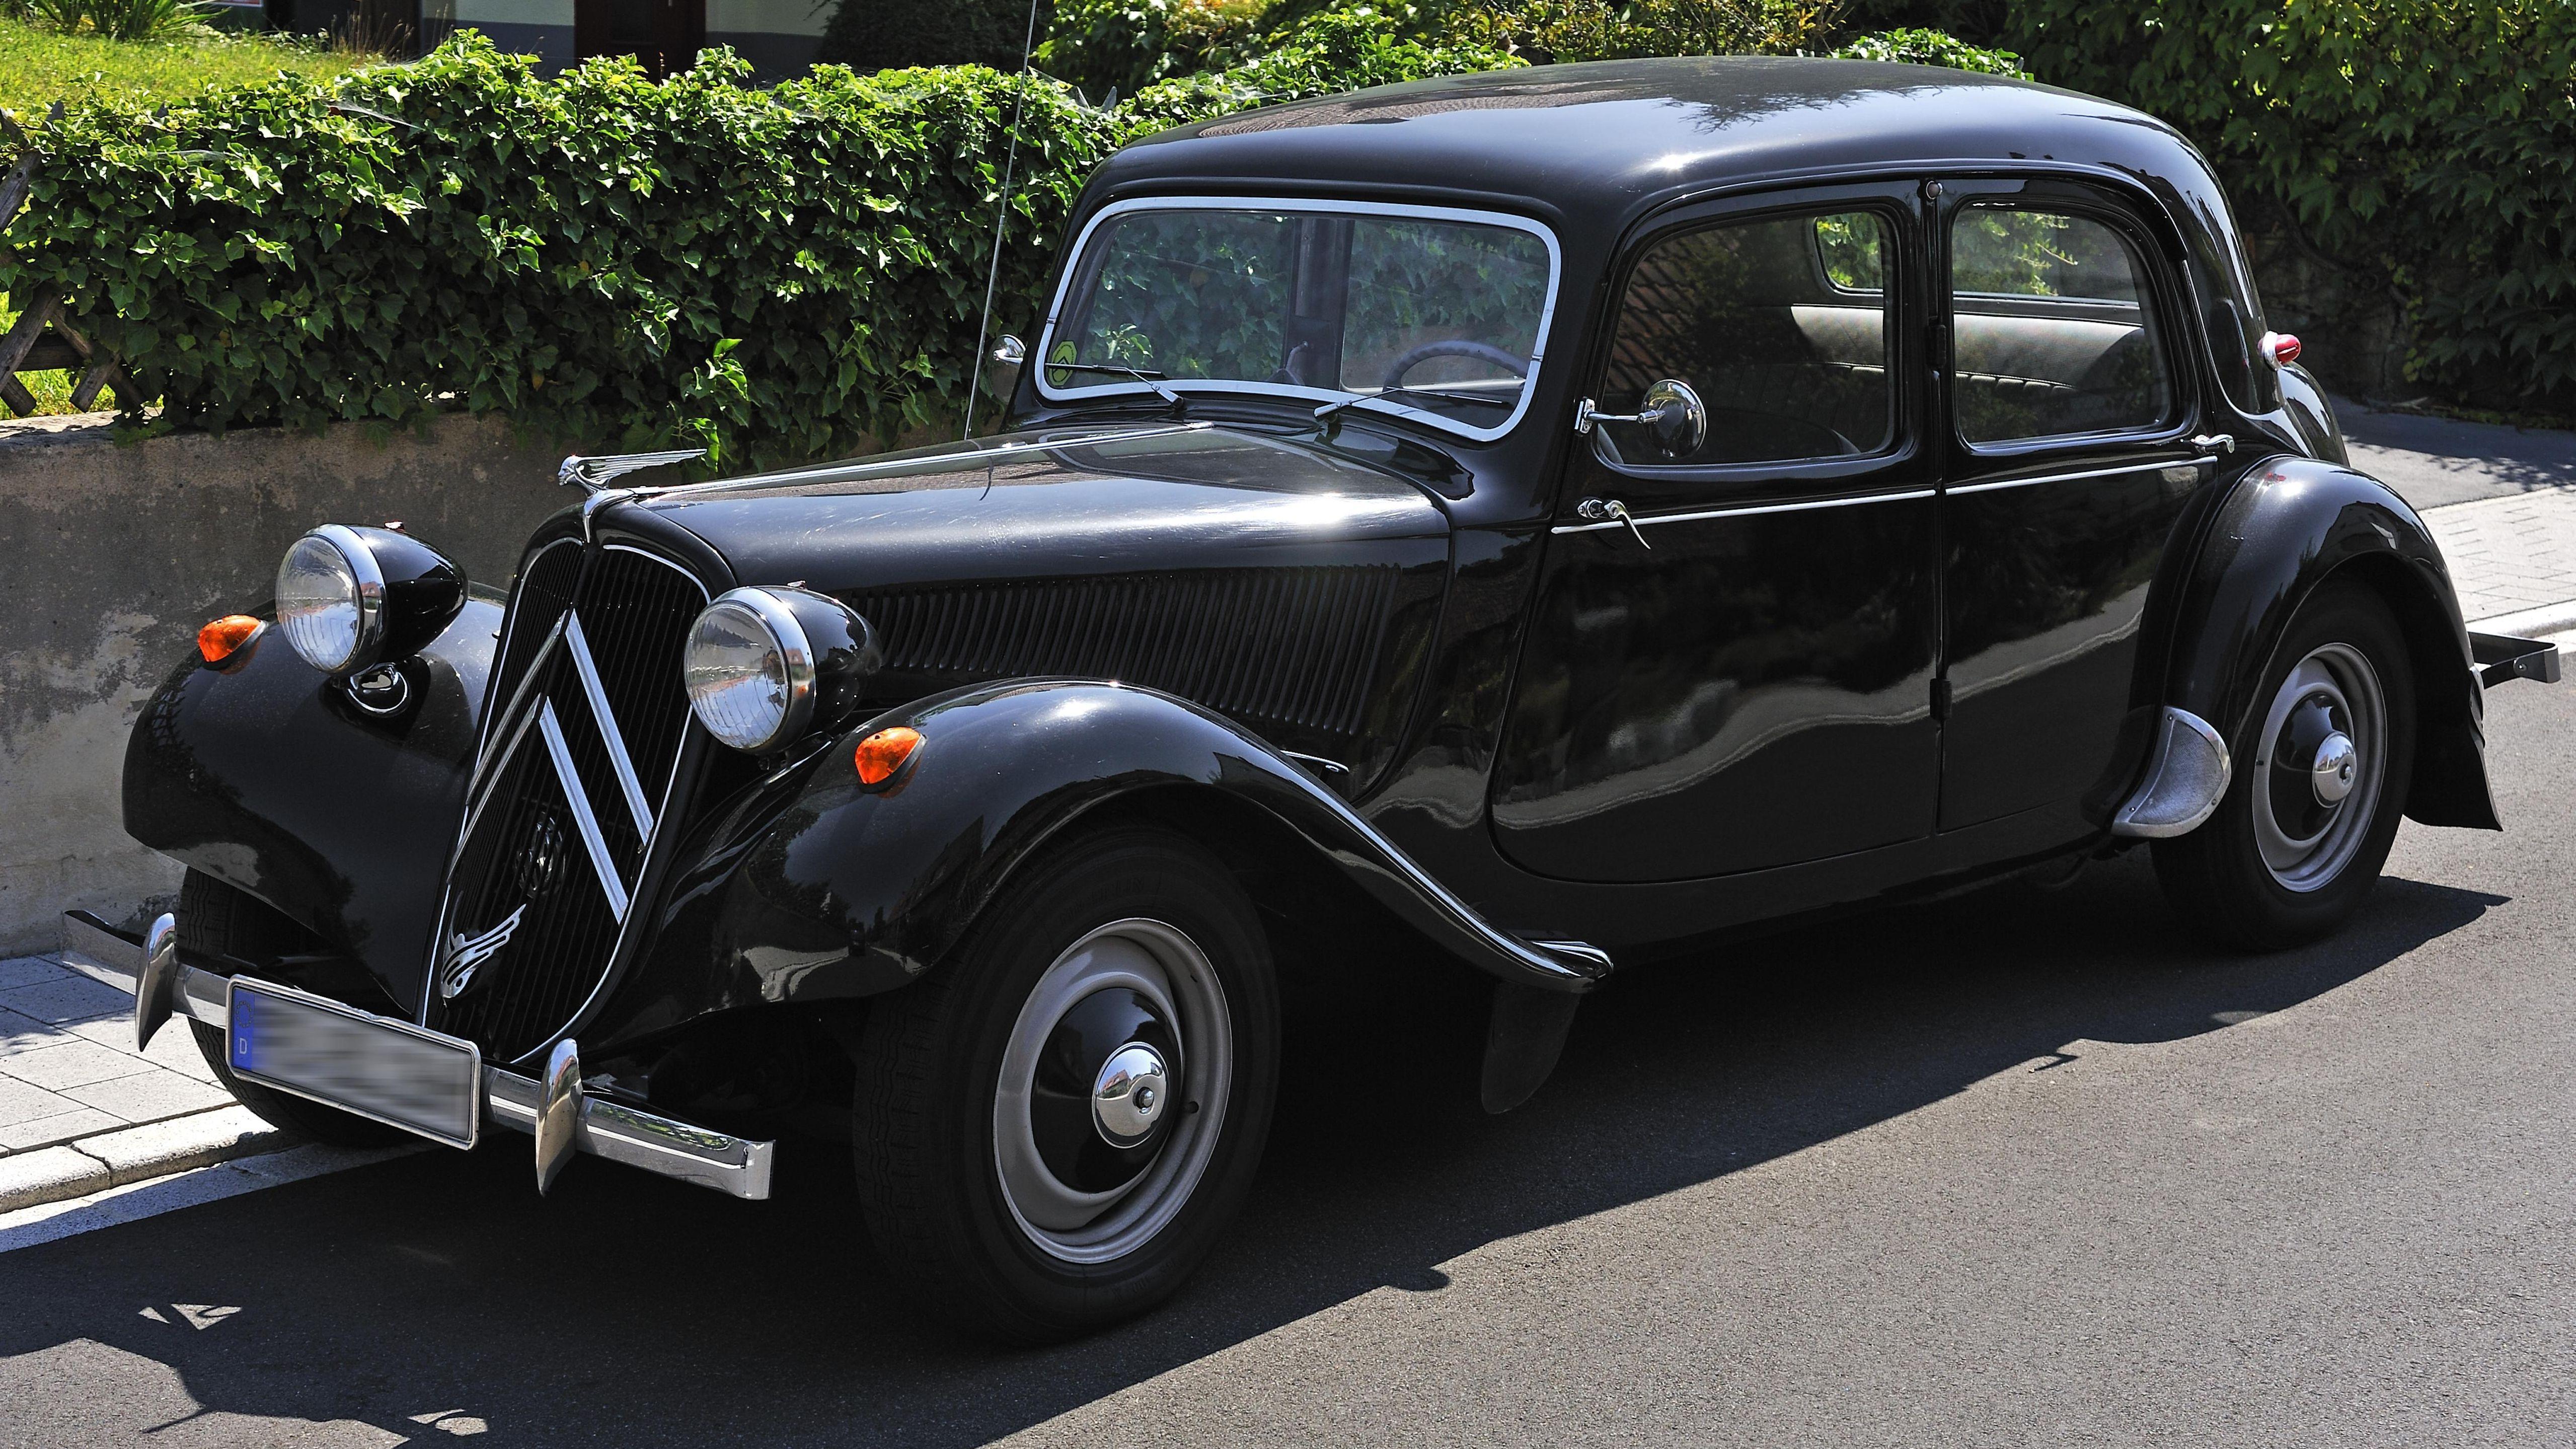 Der Citroën 11 CV Baujahr 1938, sogenannter Gangster-Citroen